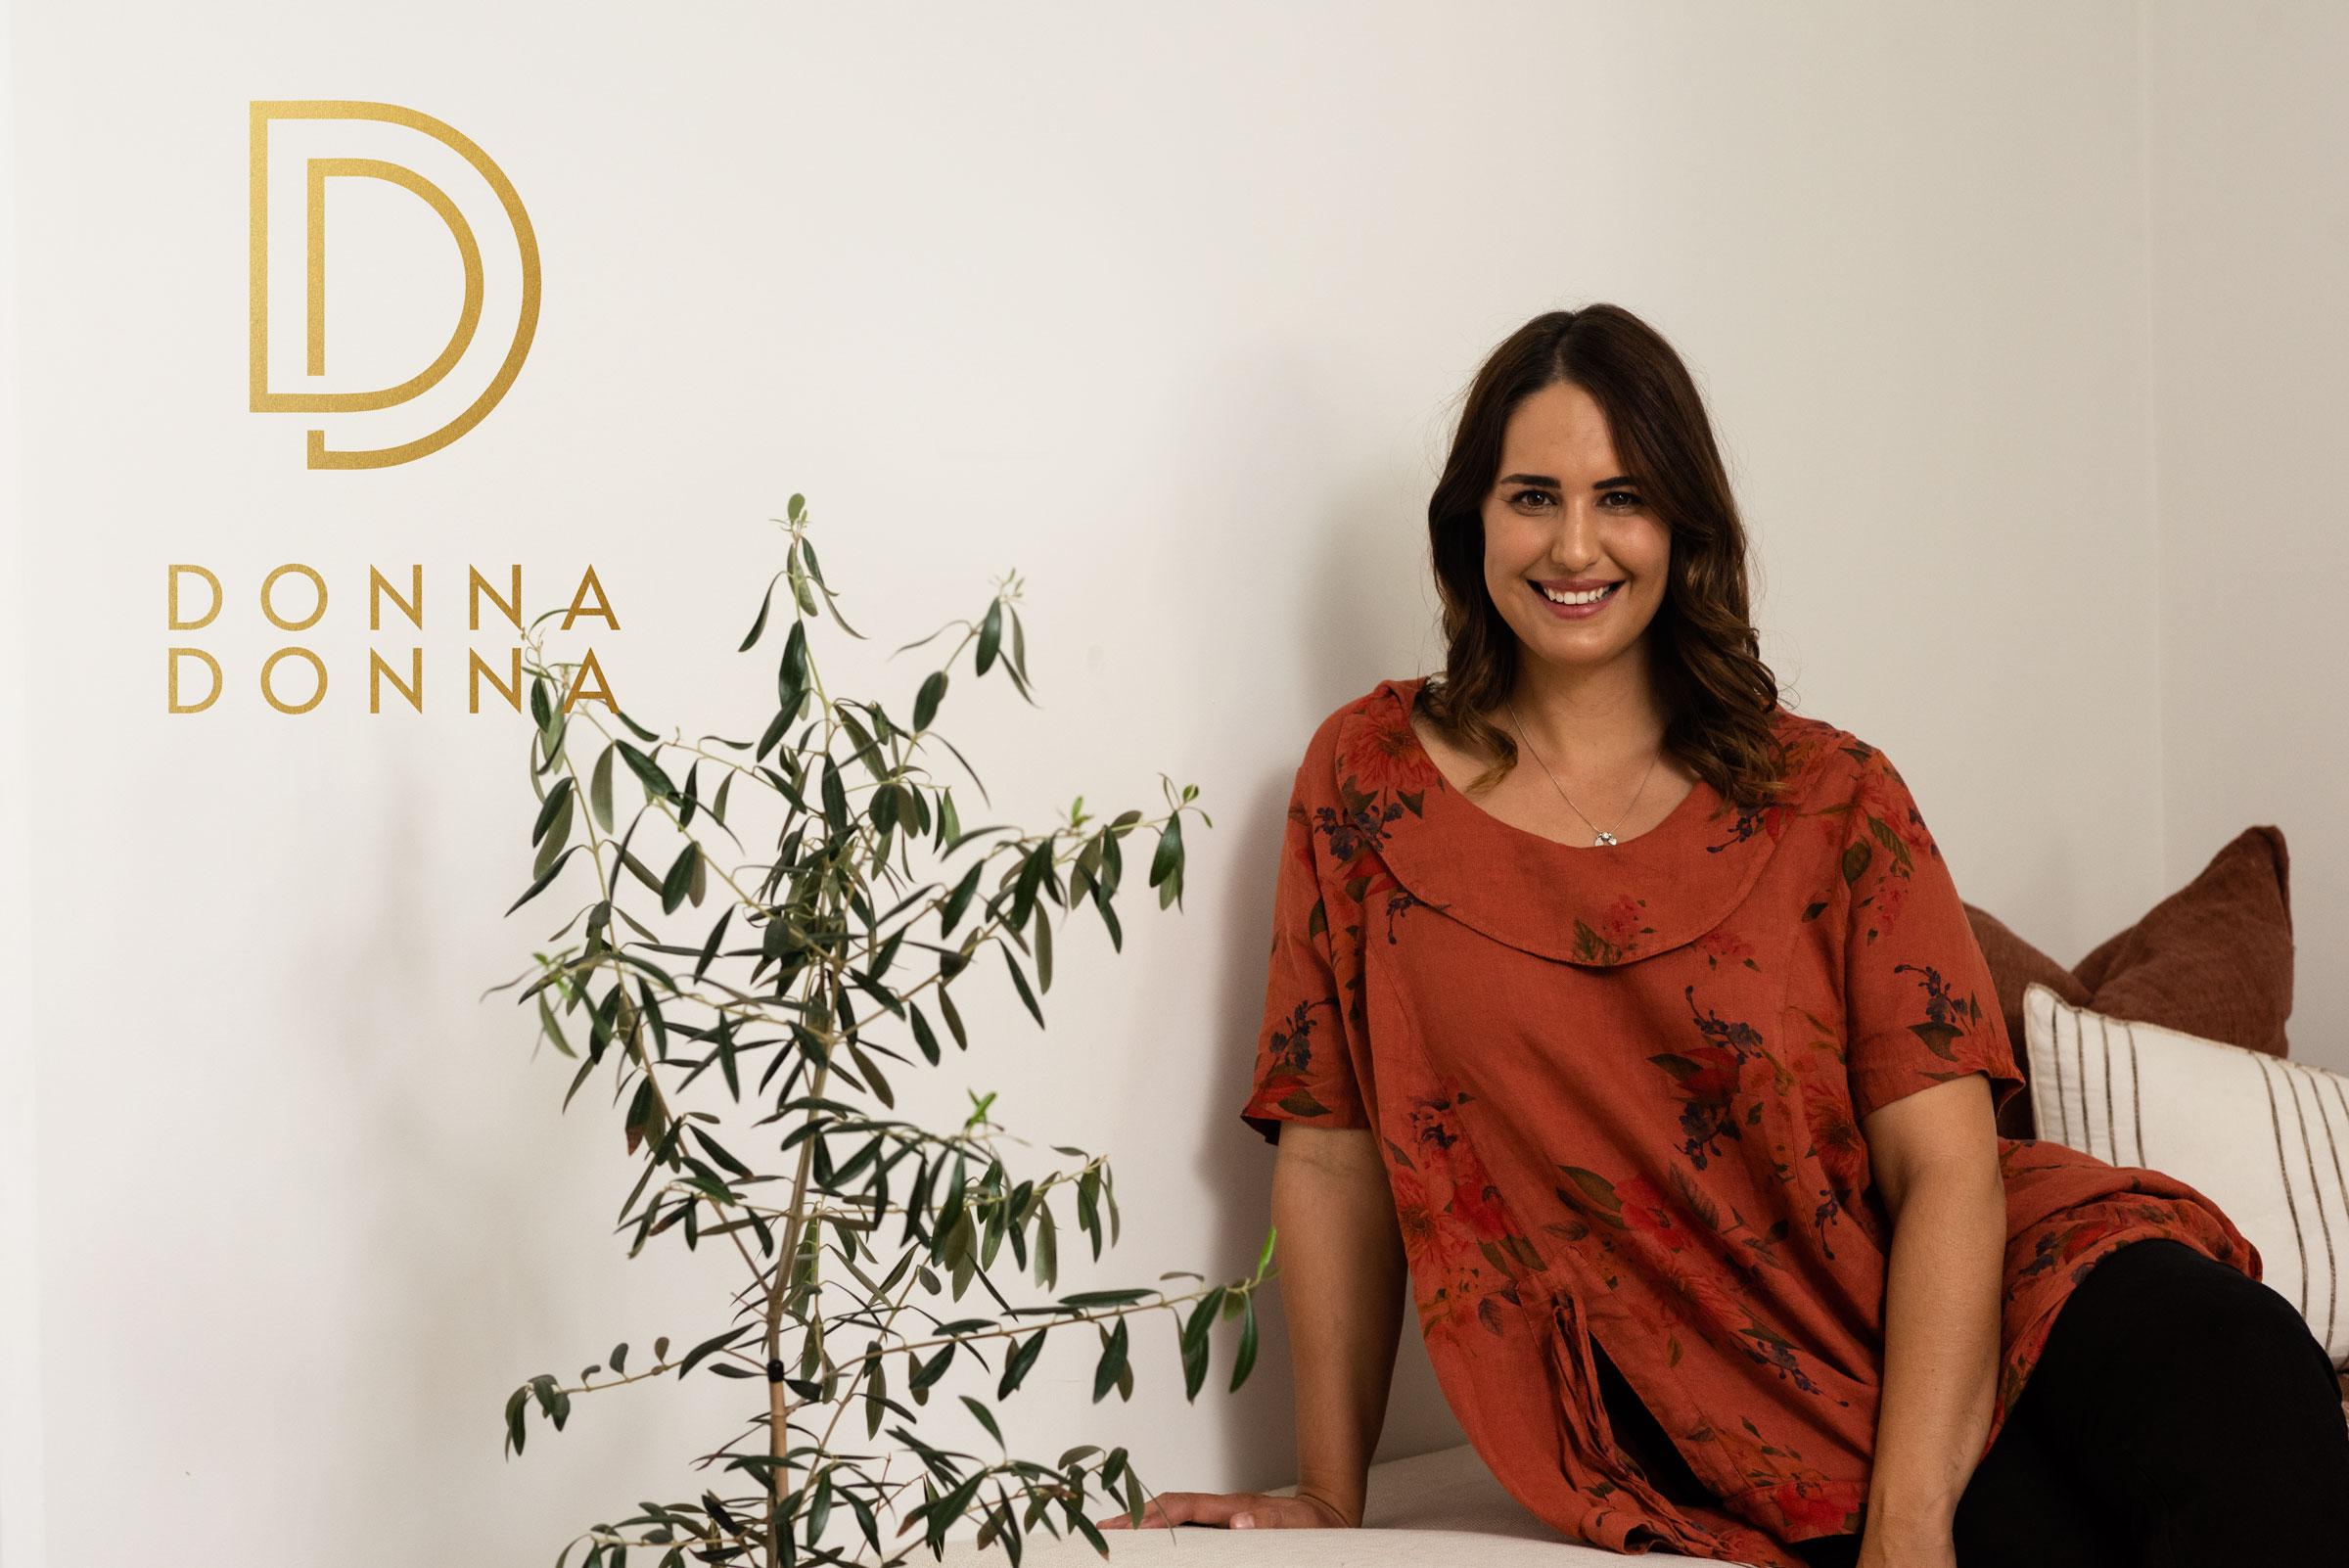 Donna Donna Linen Clothing Australia